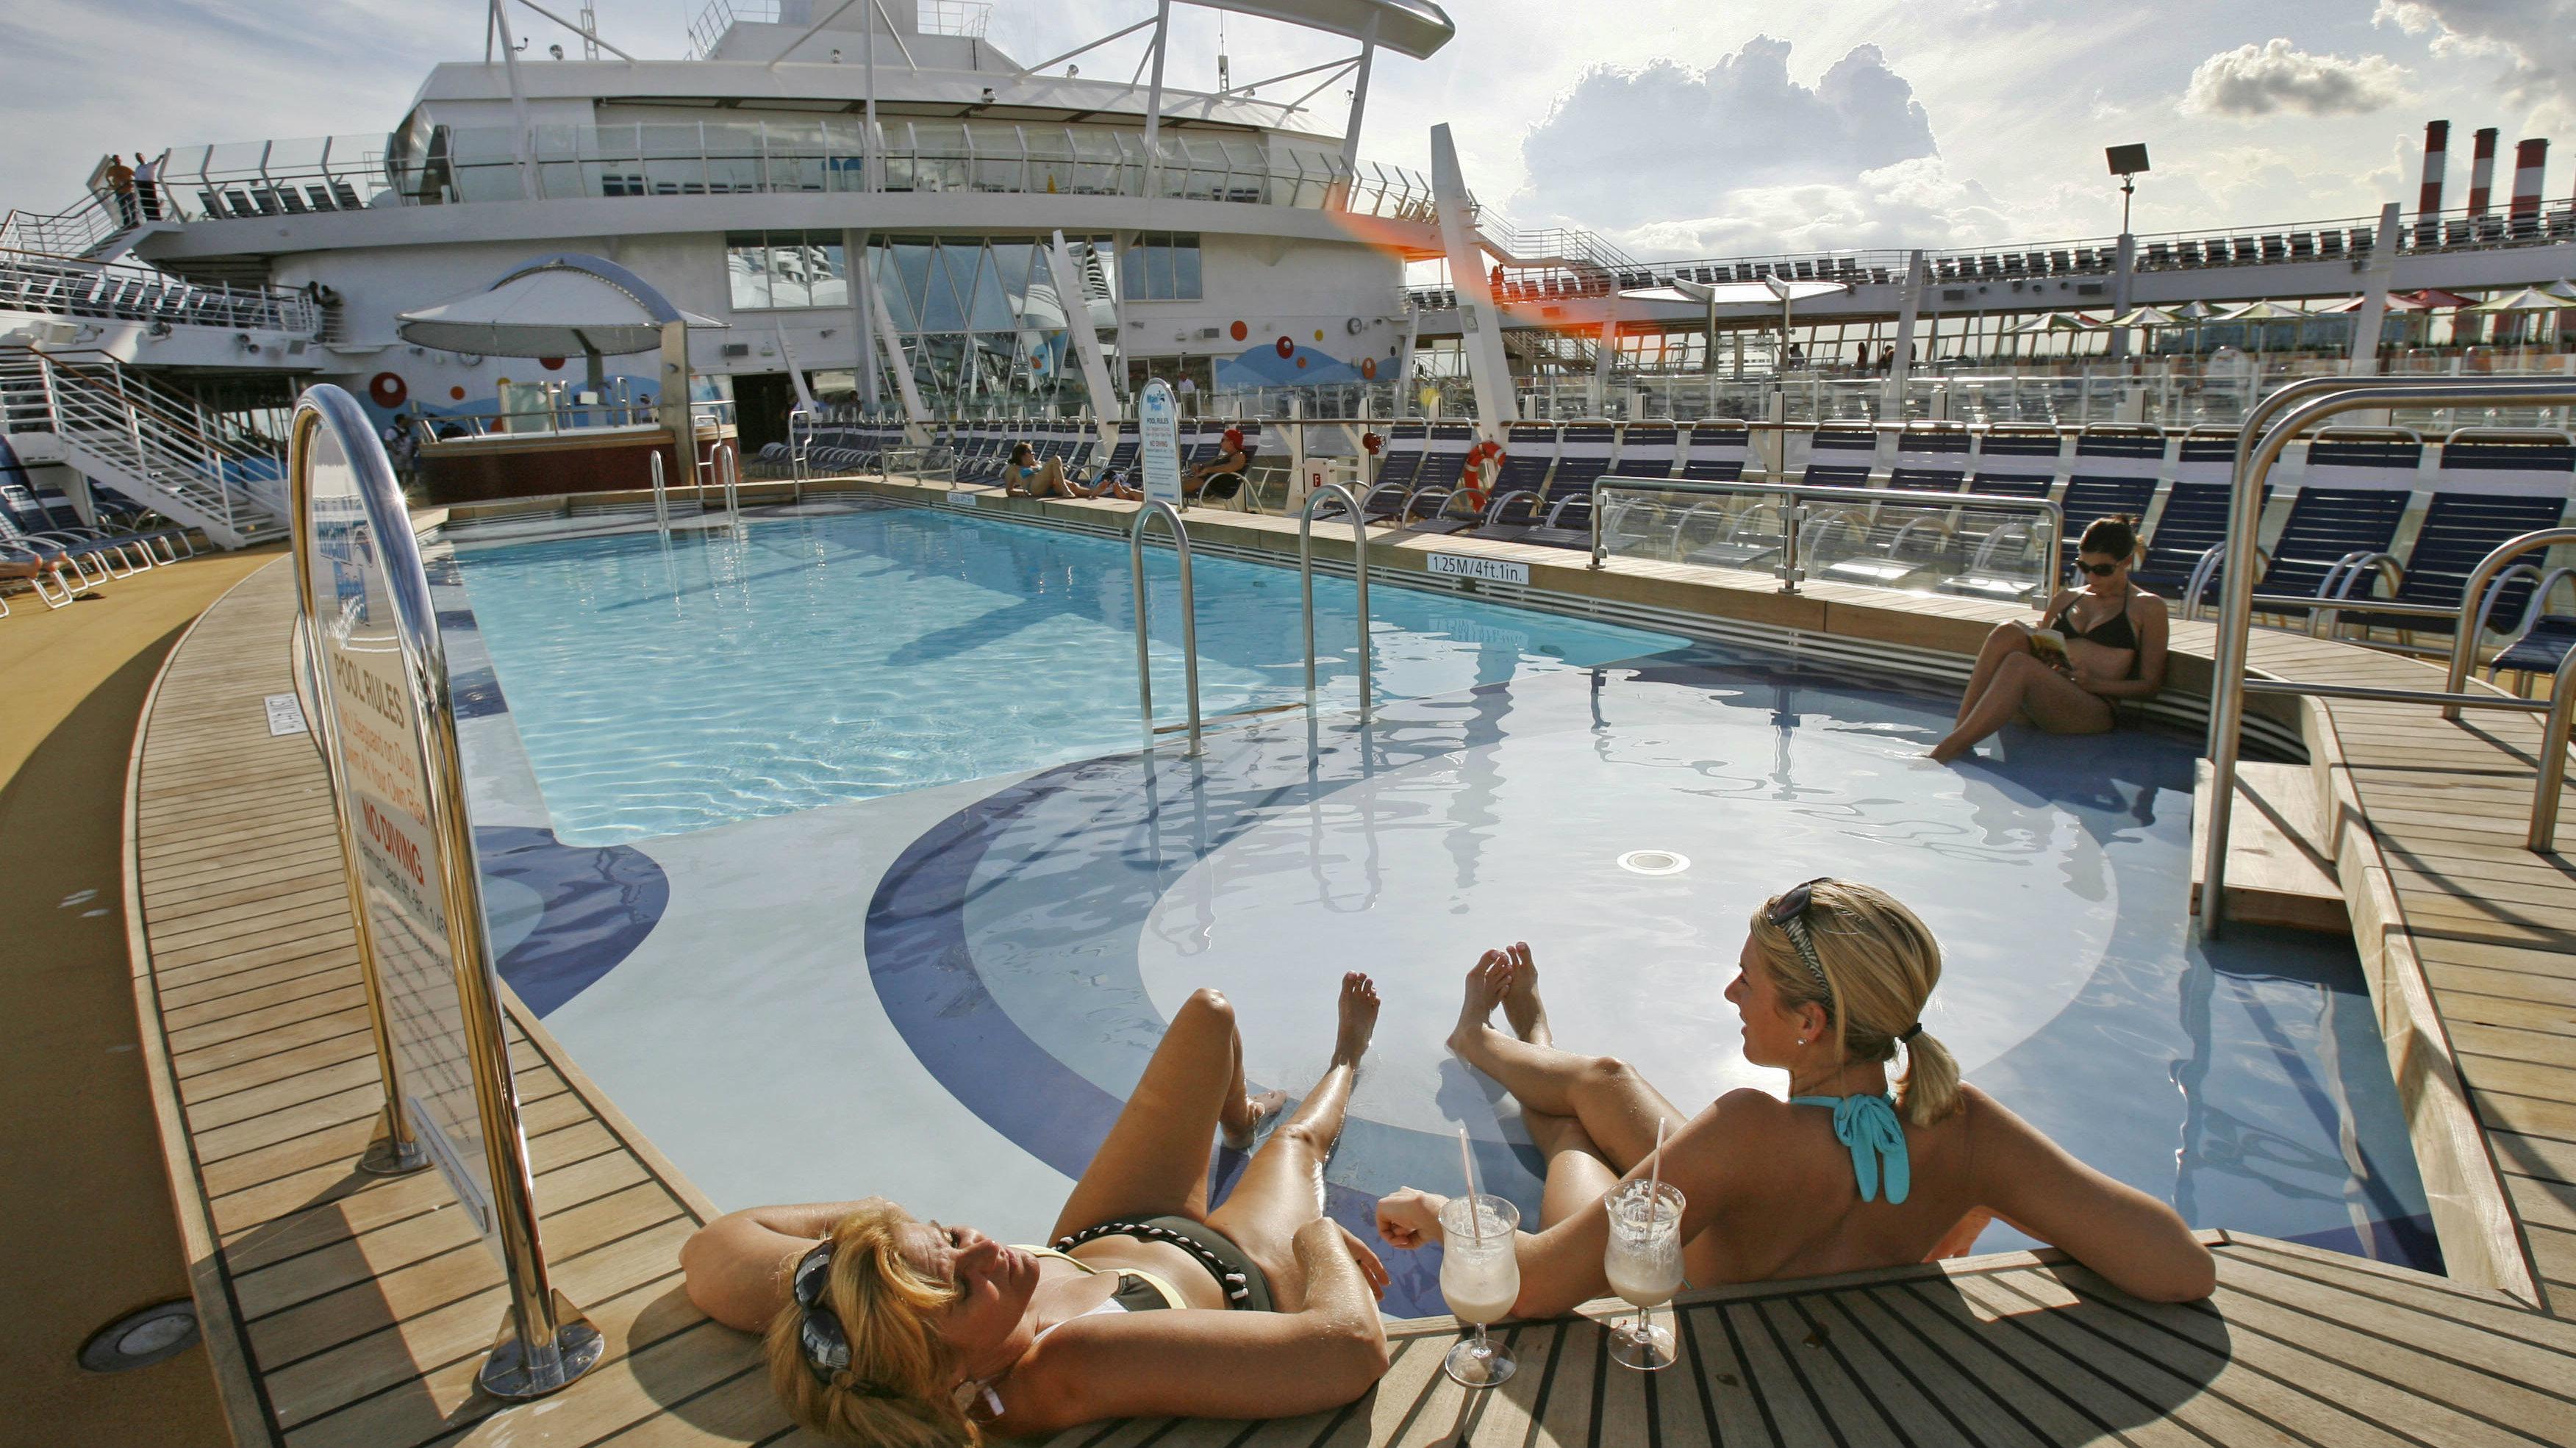 Royal Caribbean pool